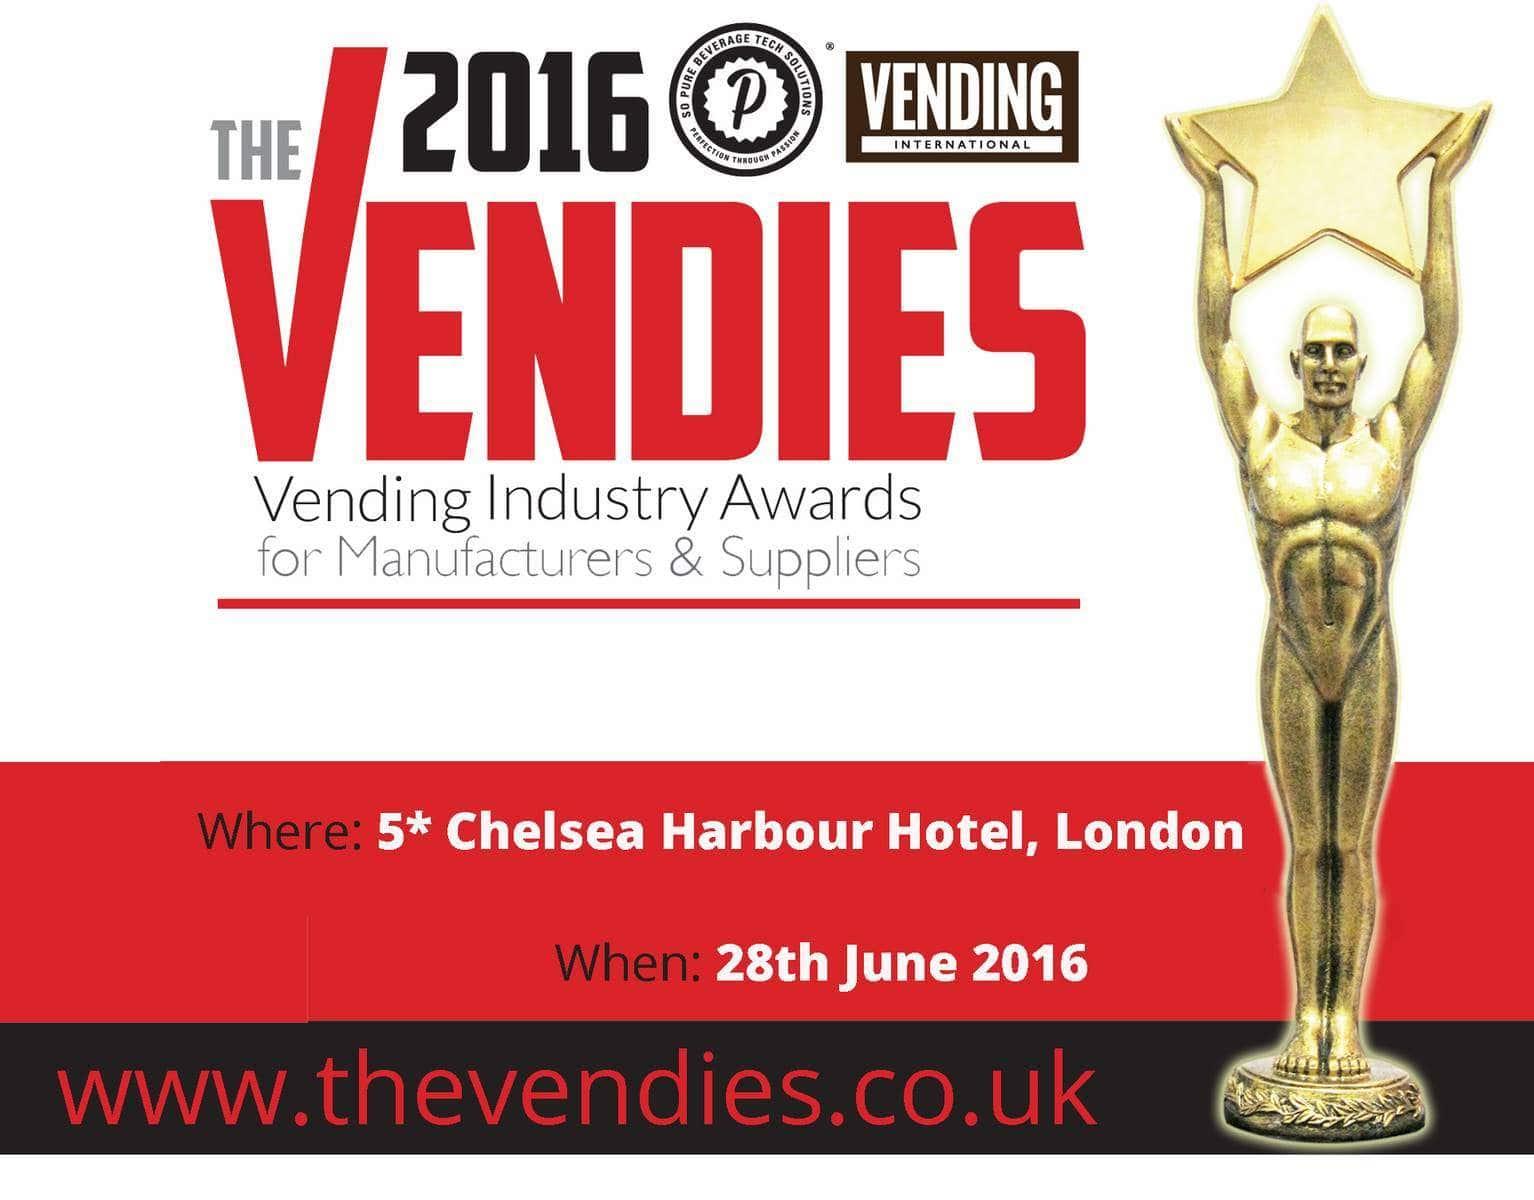 EDWCA & The Vendies 2016